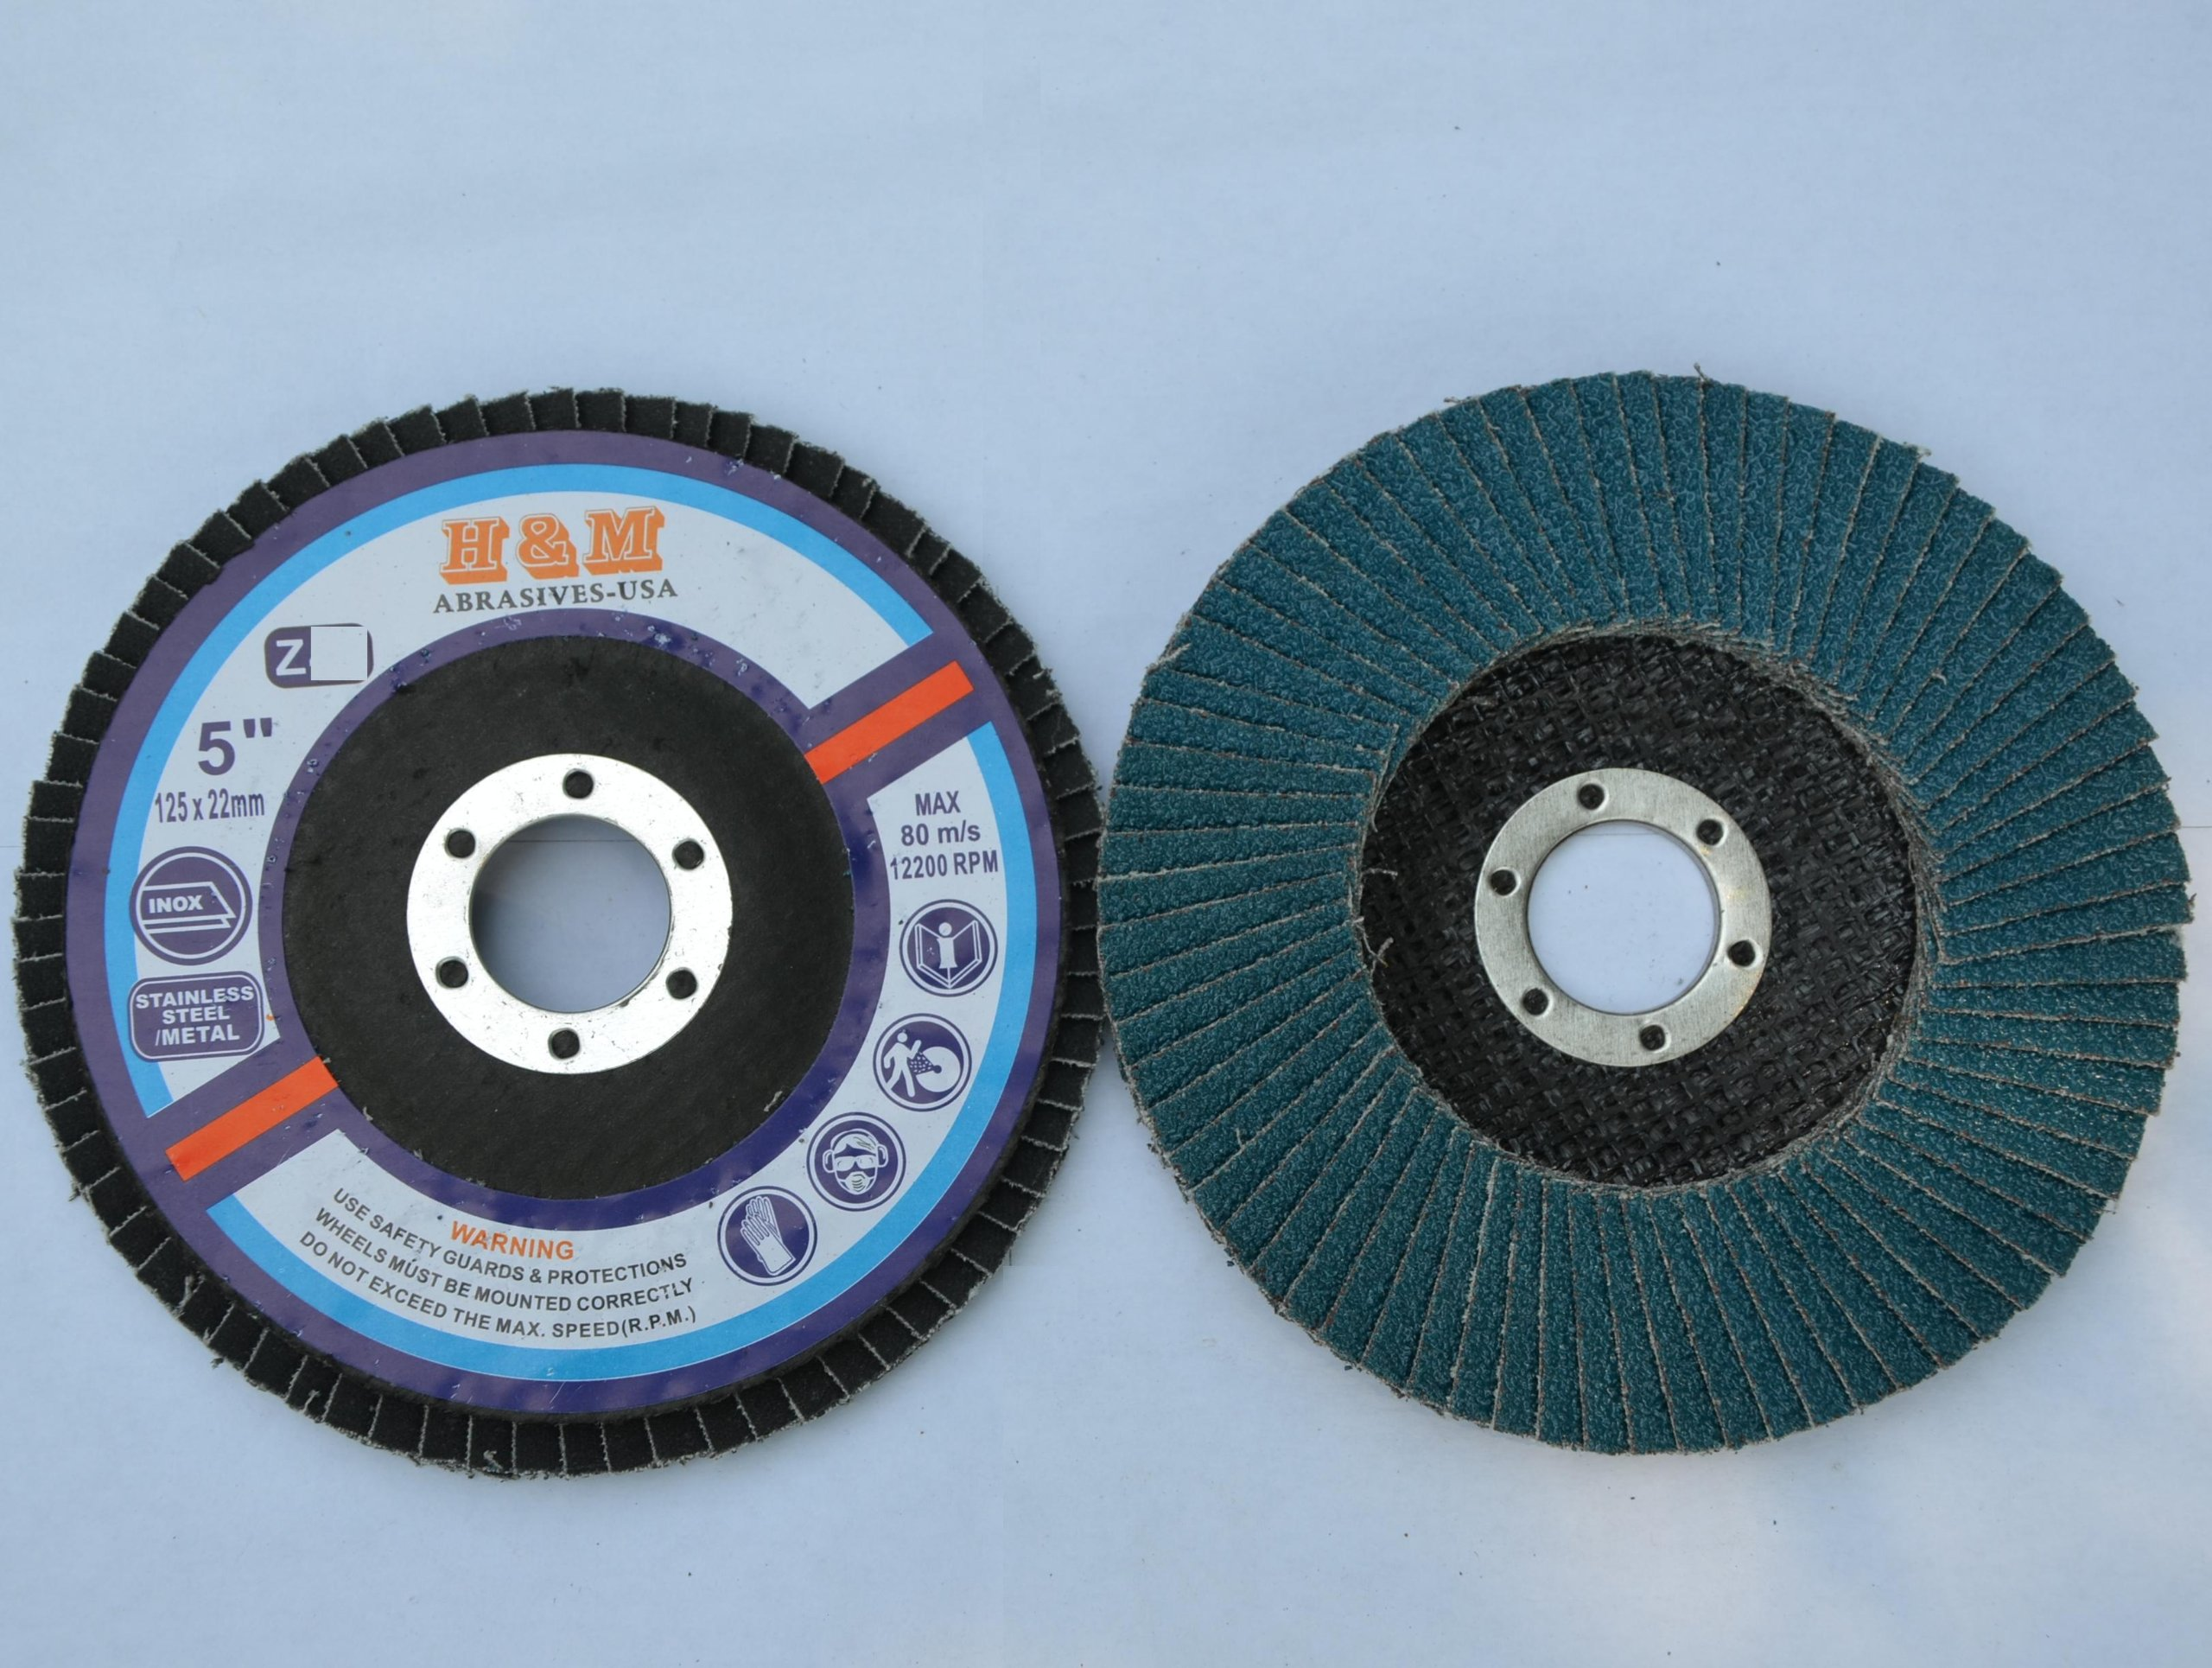 10pcs Premium FLAP DISCS 5'' x 7/8'' Zirconia 60 grit Grinding Wheel grinder tool by H&M ABRASIVES-USA